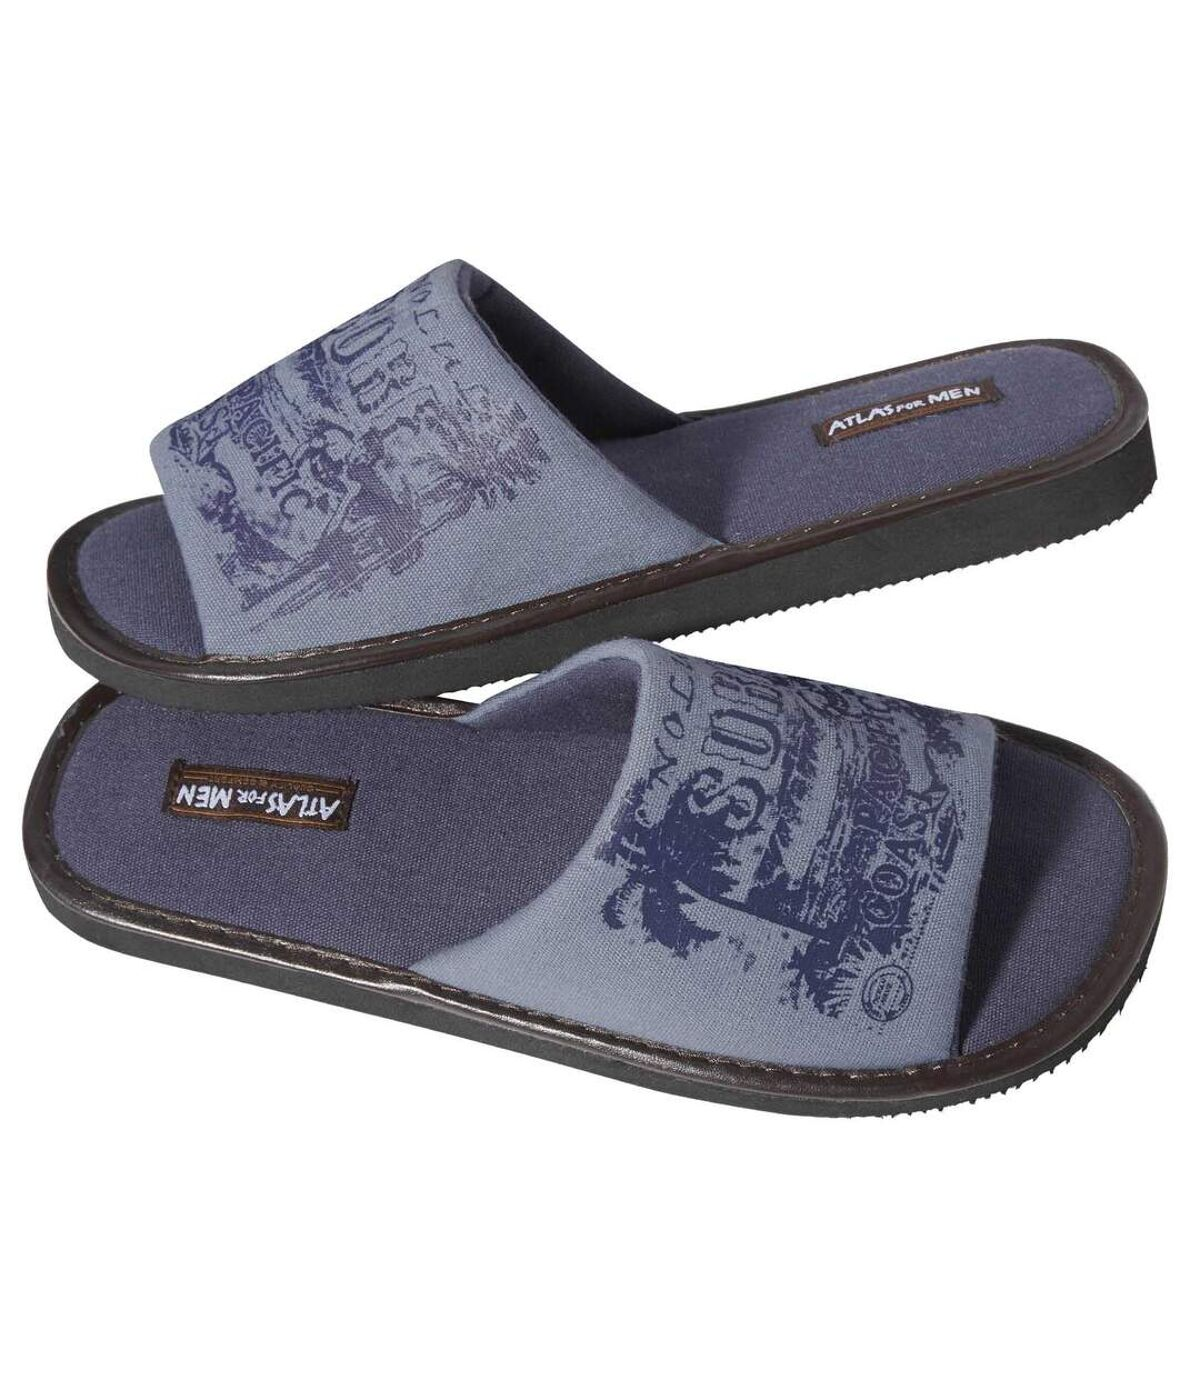 Men's Blue Indoor Slide Slippers Atlas For Men